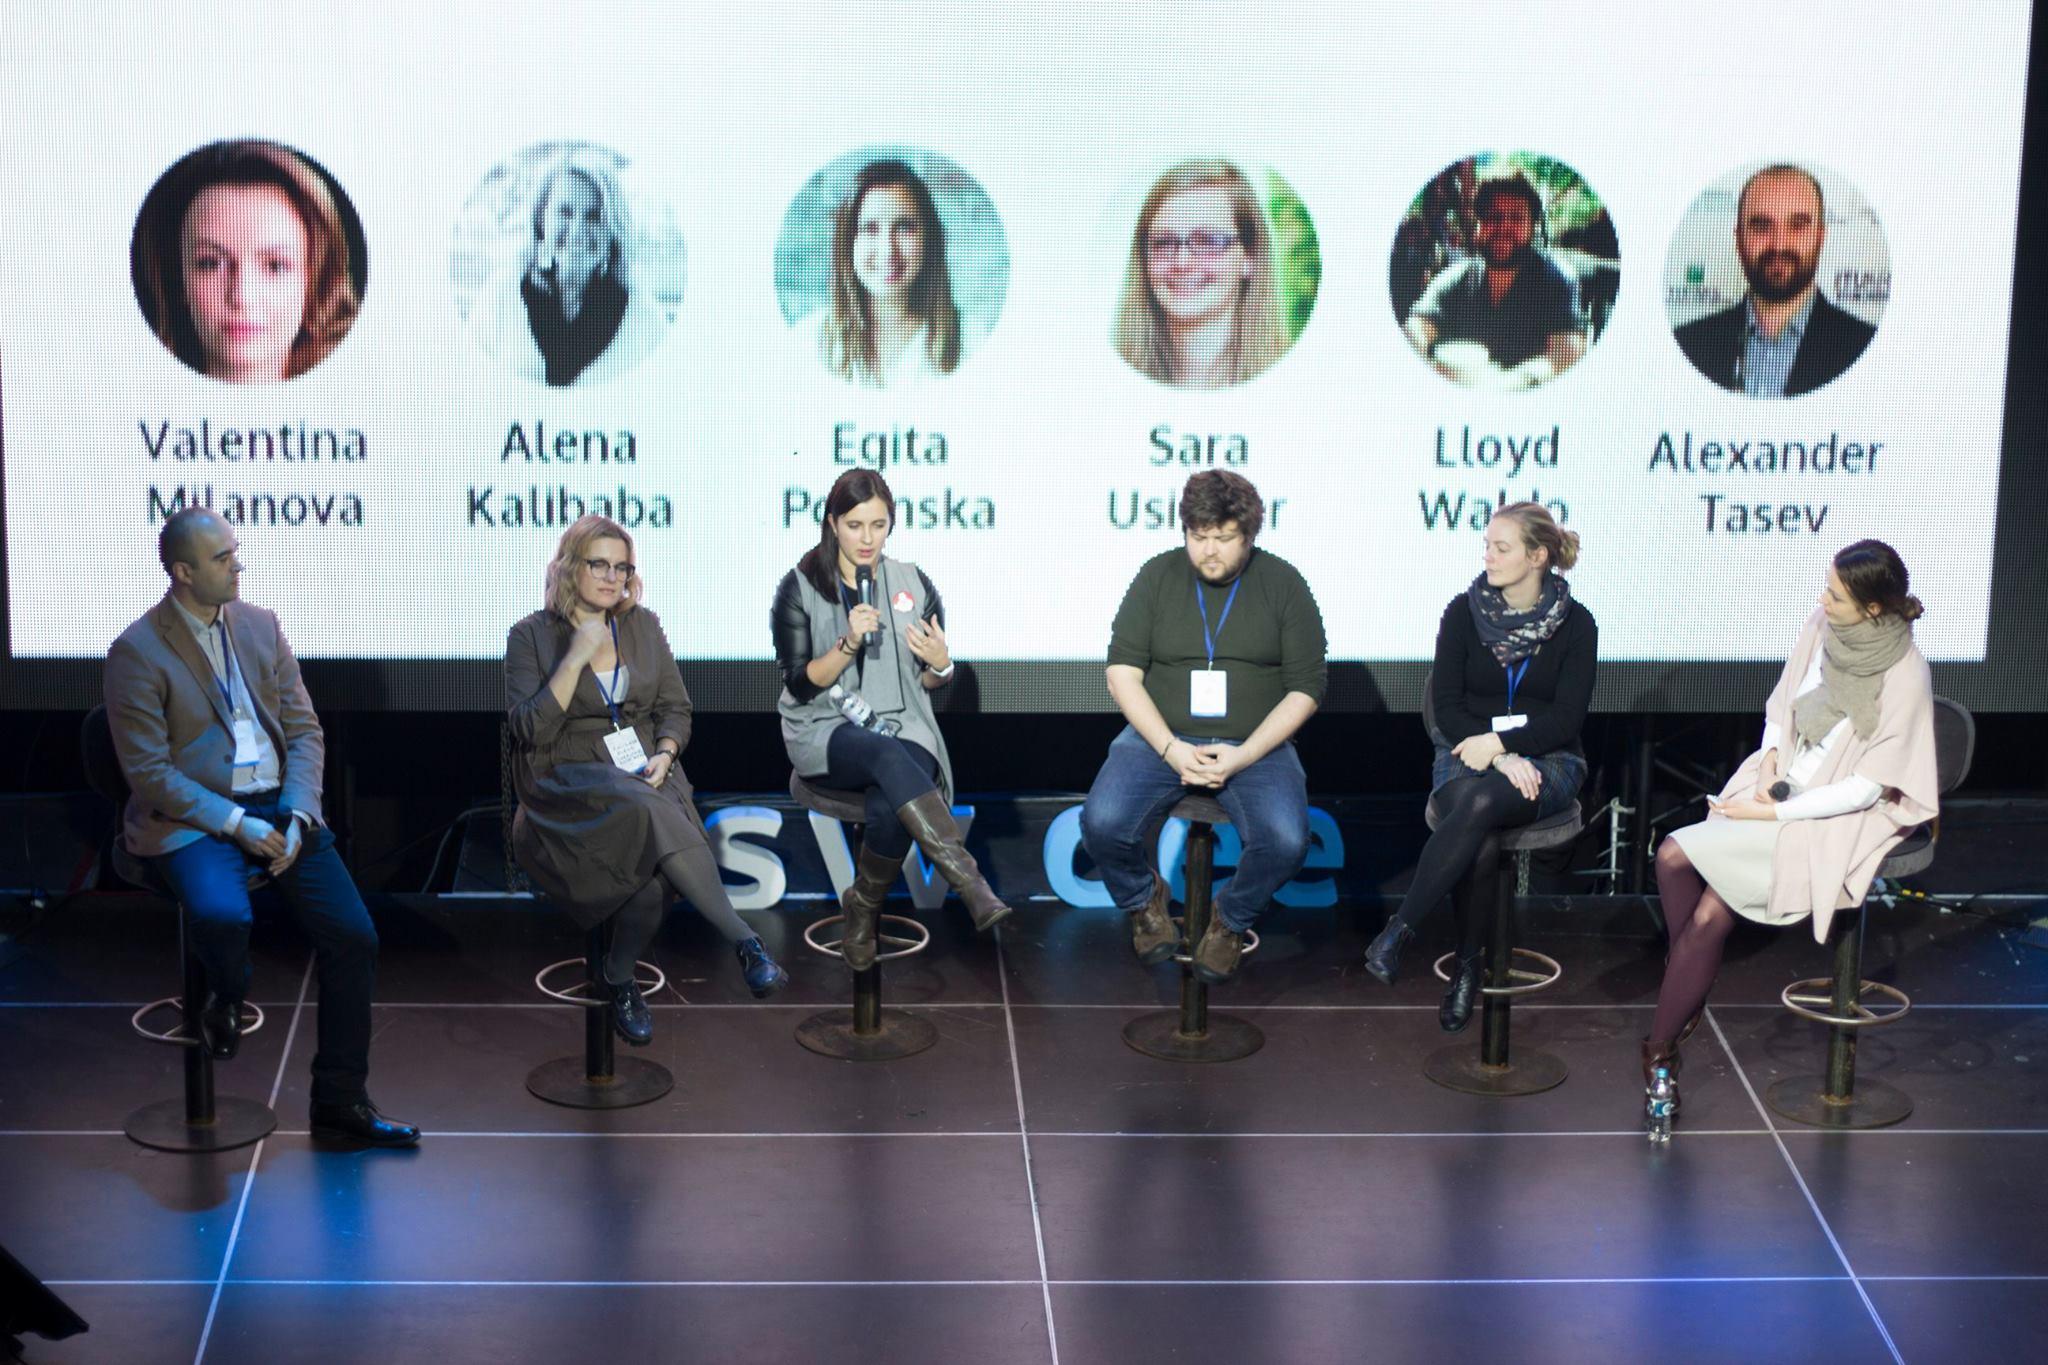 U Kyjevi projde najmasštabnišyj civic tech forum — Seedstars CEE Summit